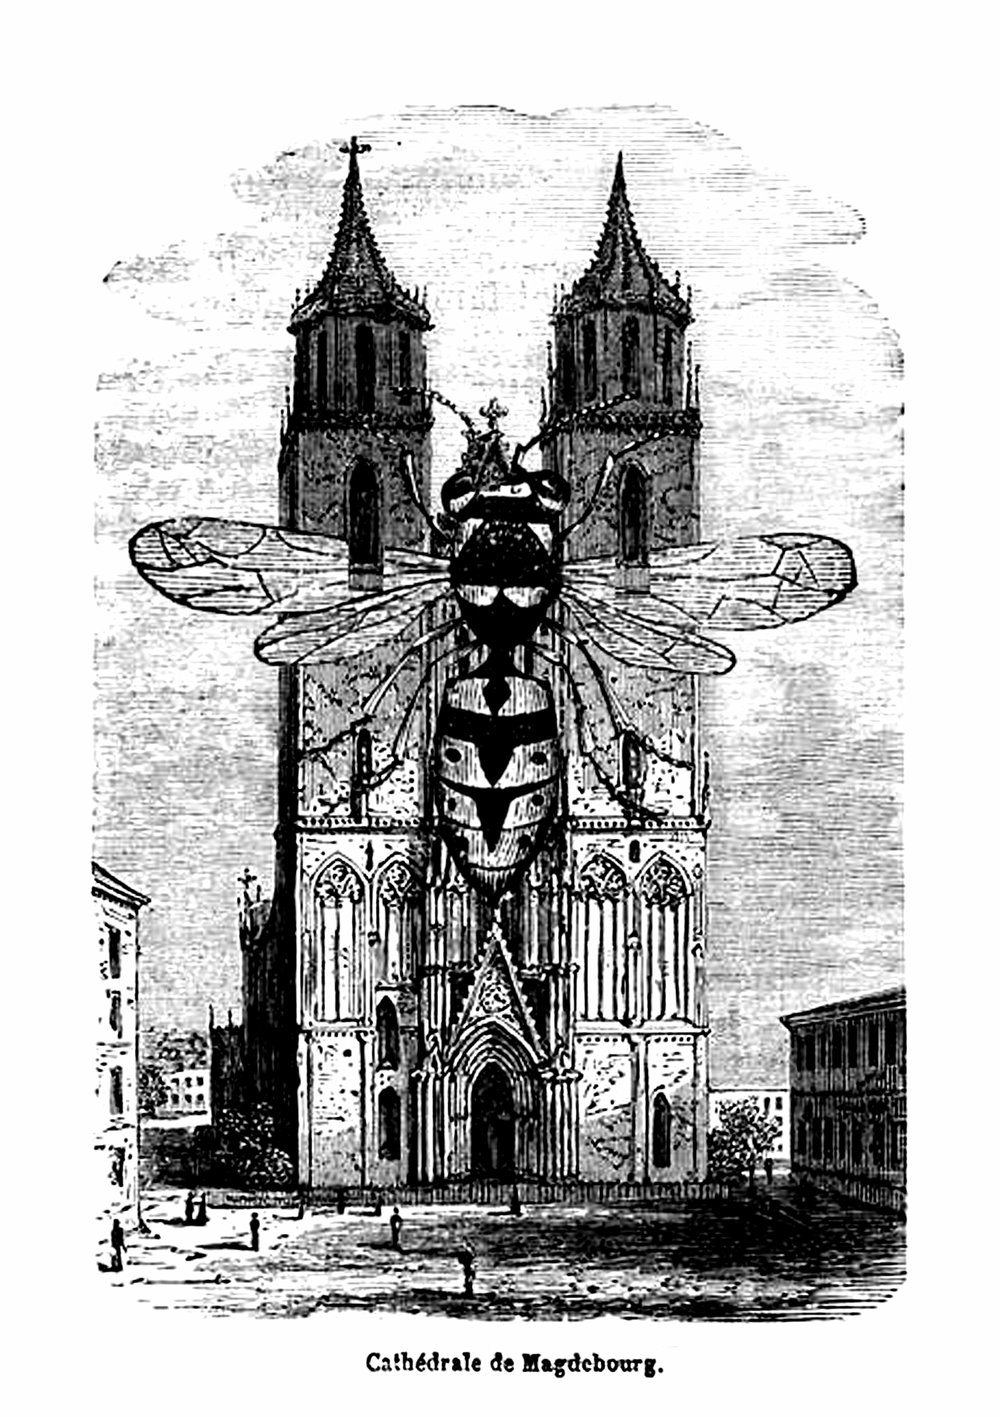 magdeburg-cathedral print.jpg